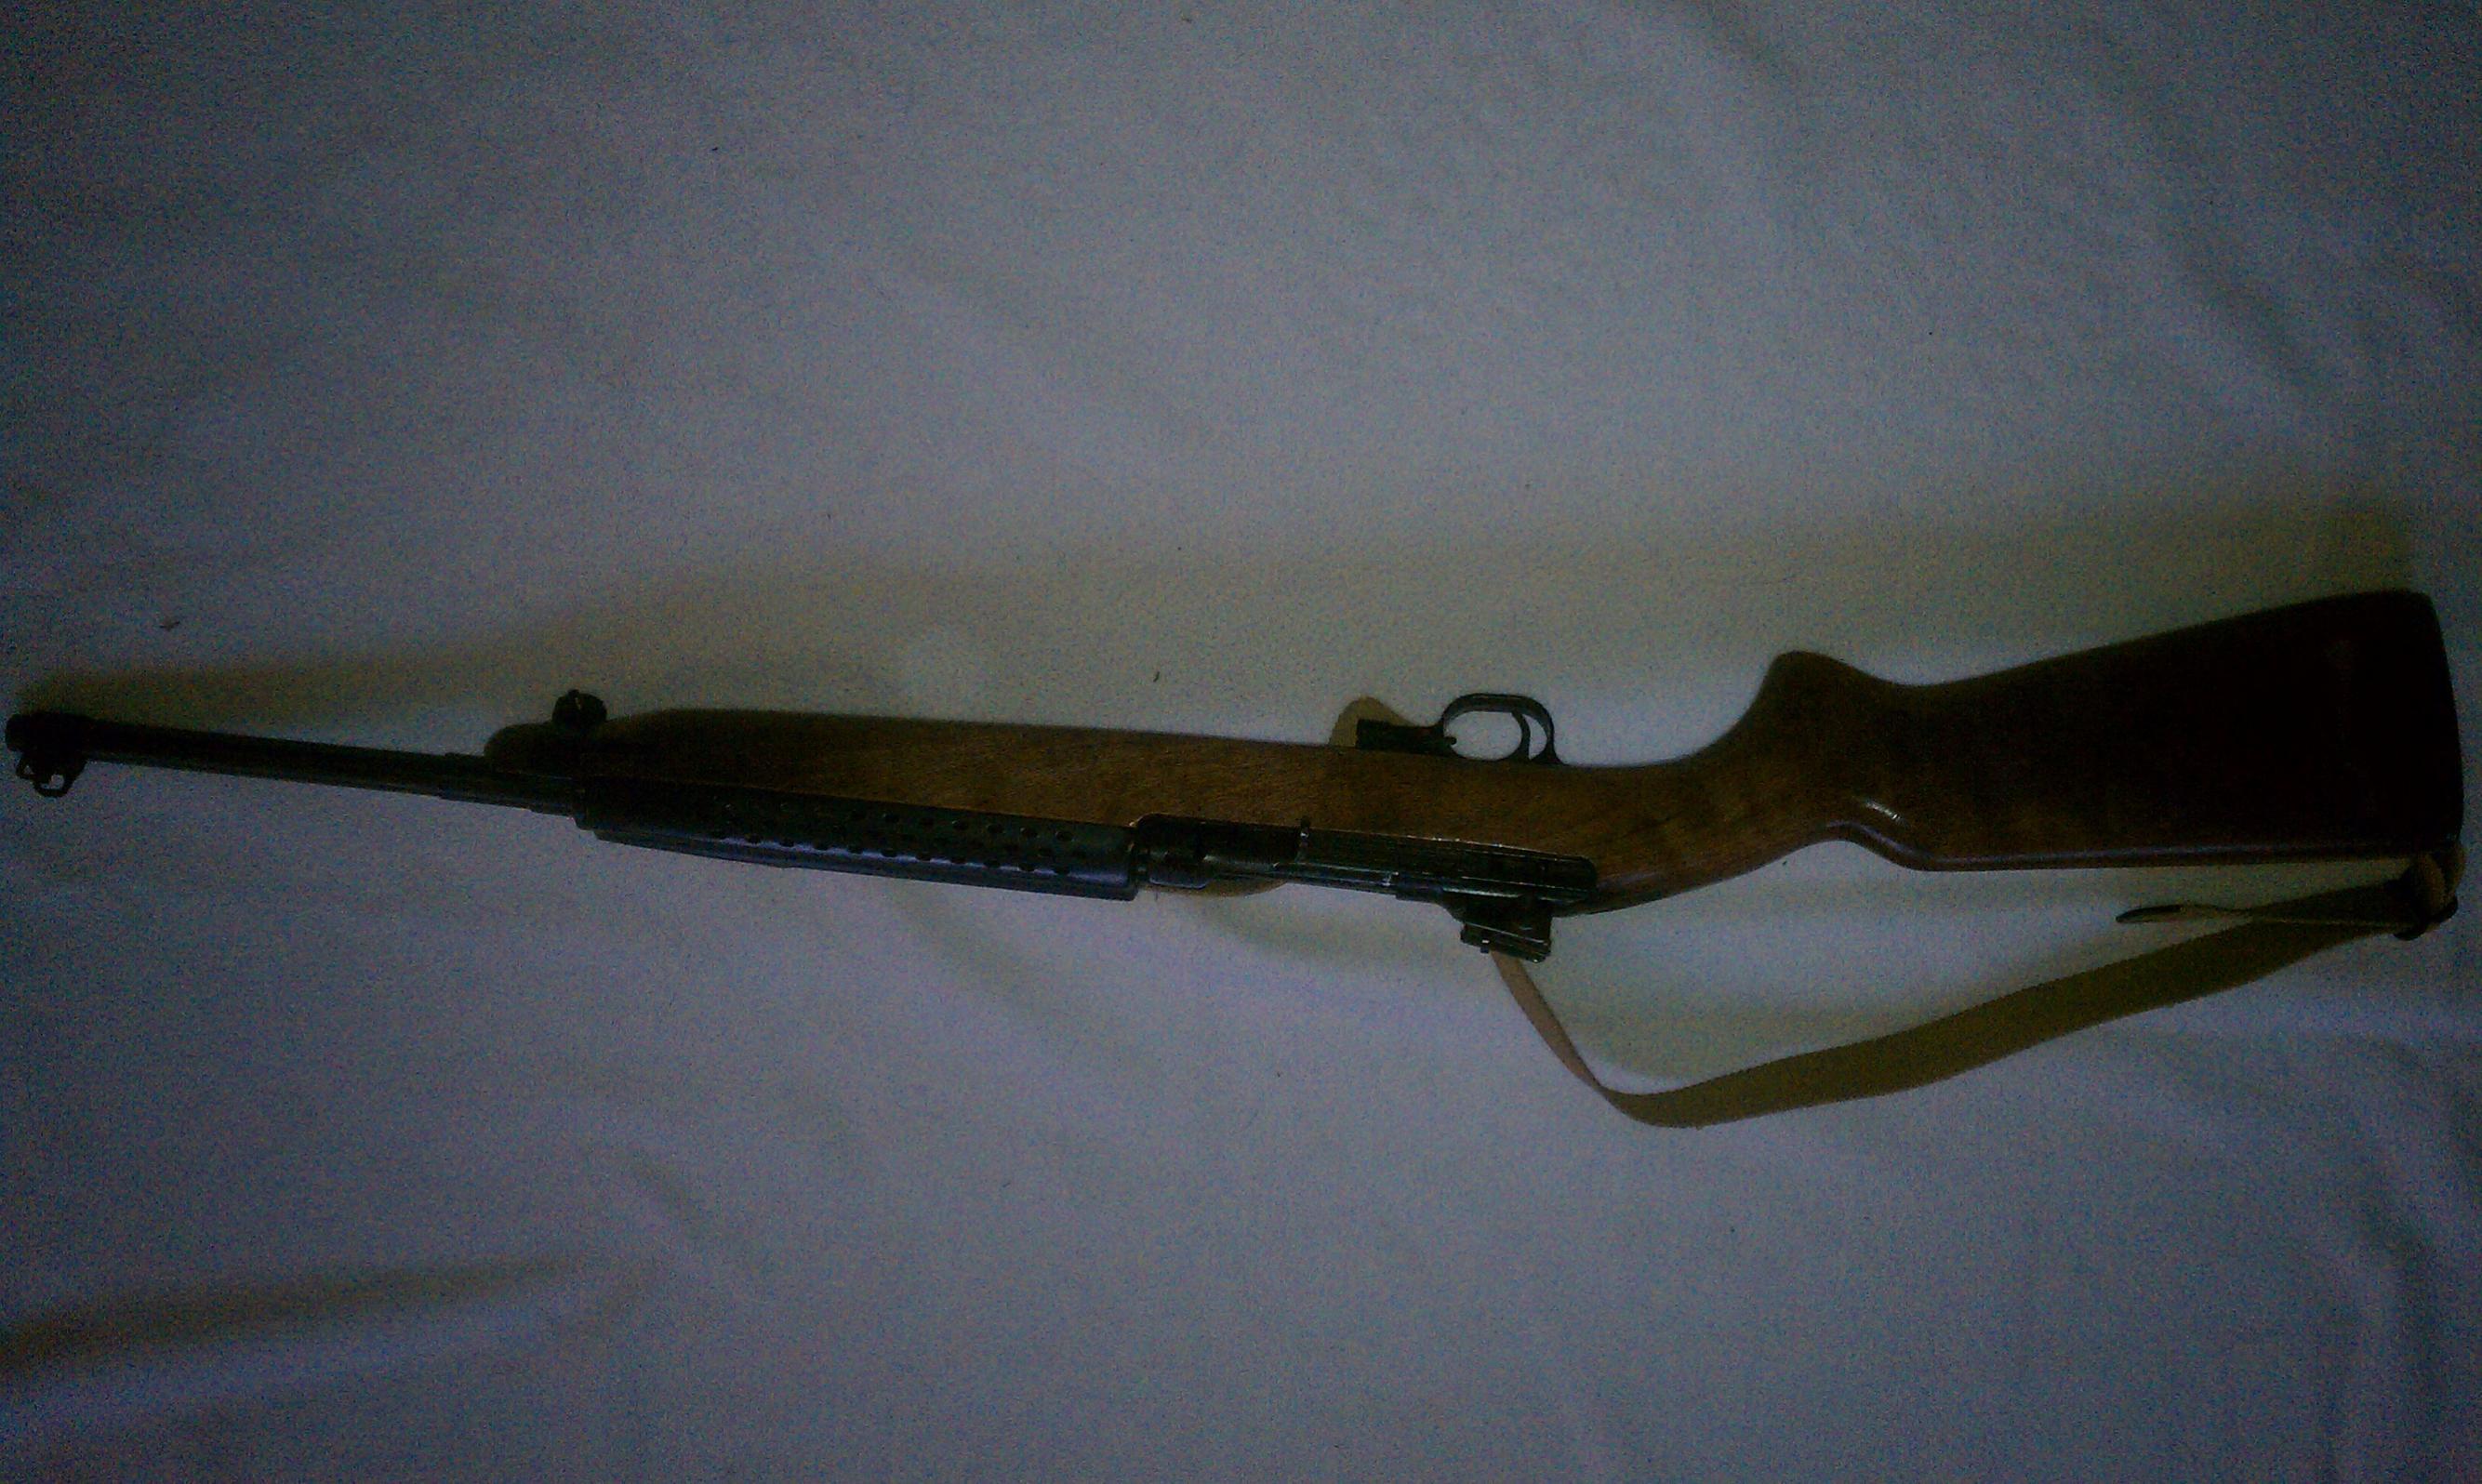 FS: Alabama ,M1 Carbine .30 cal-imag0453.jpg